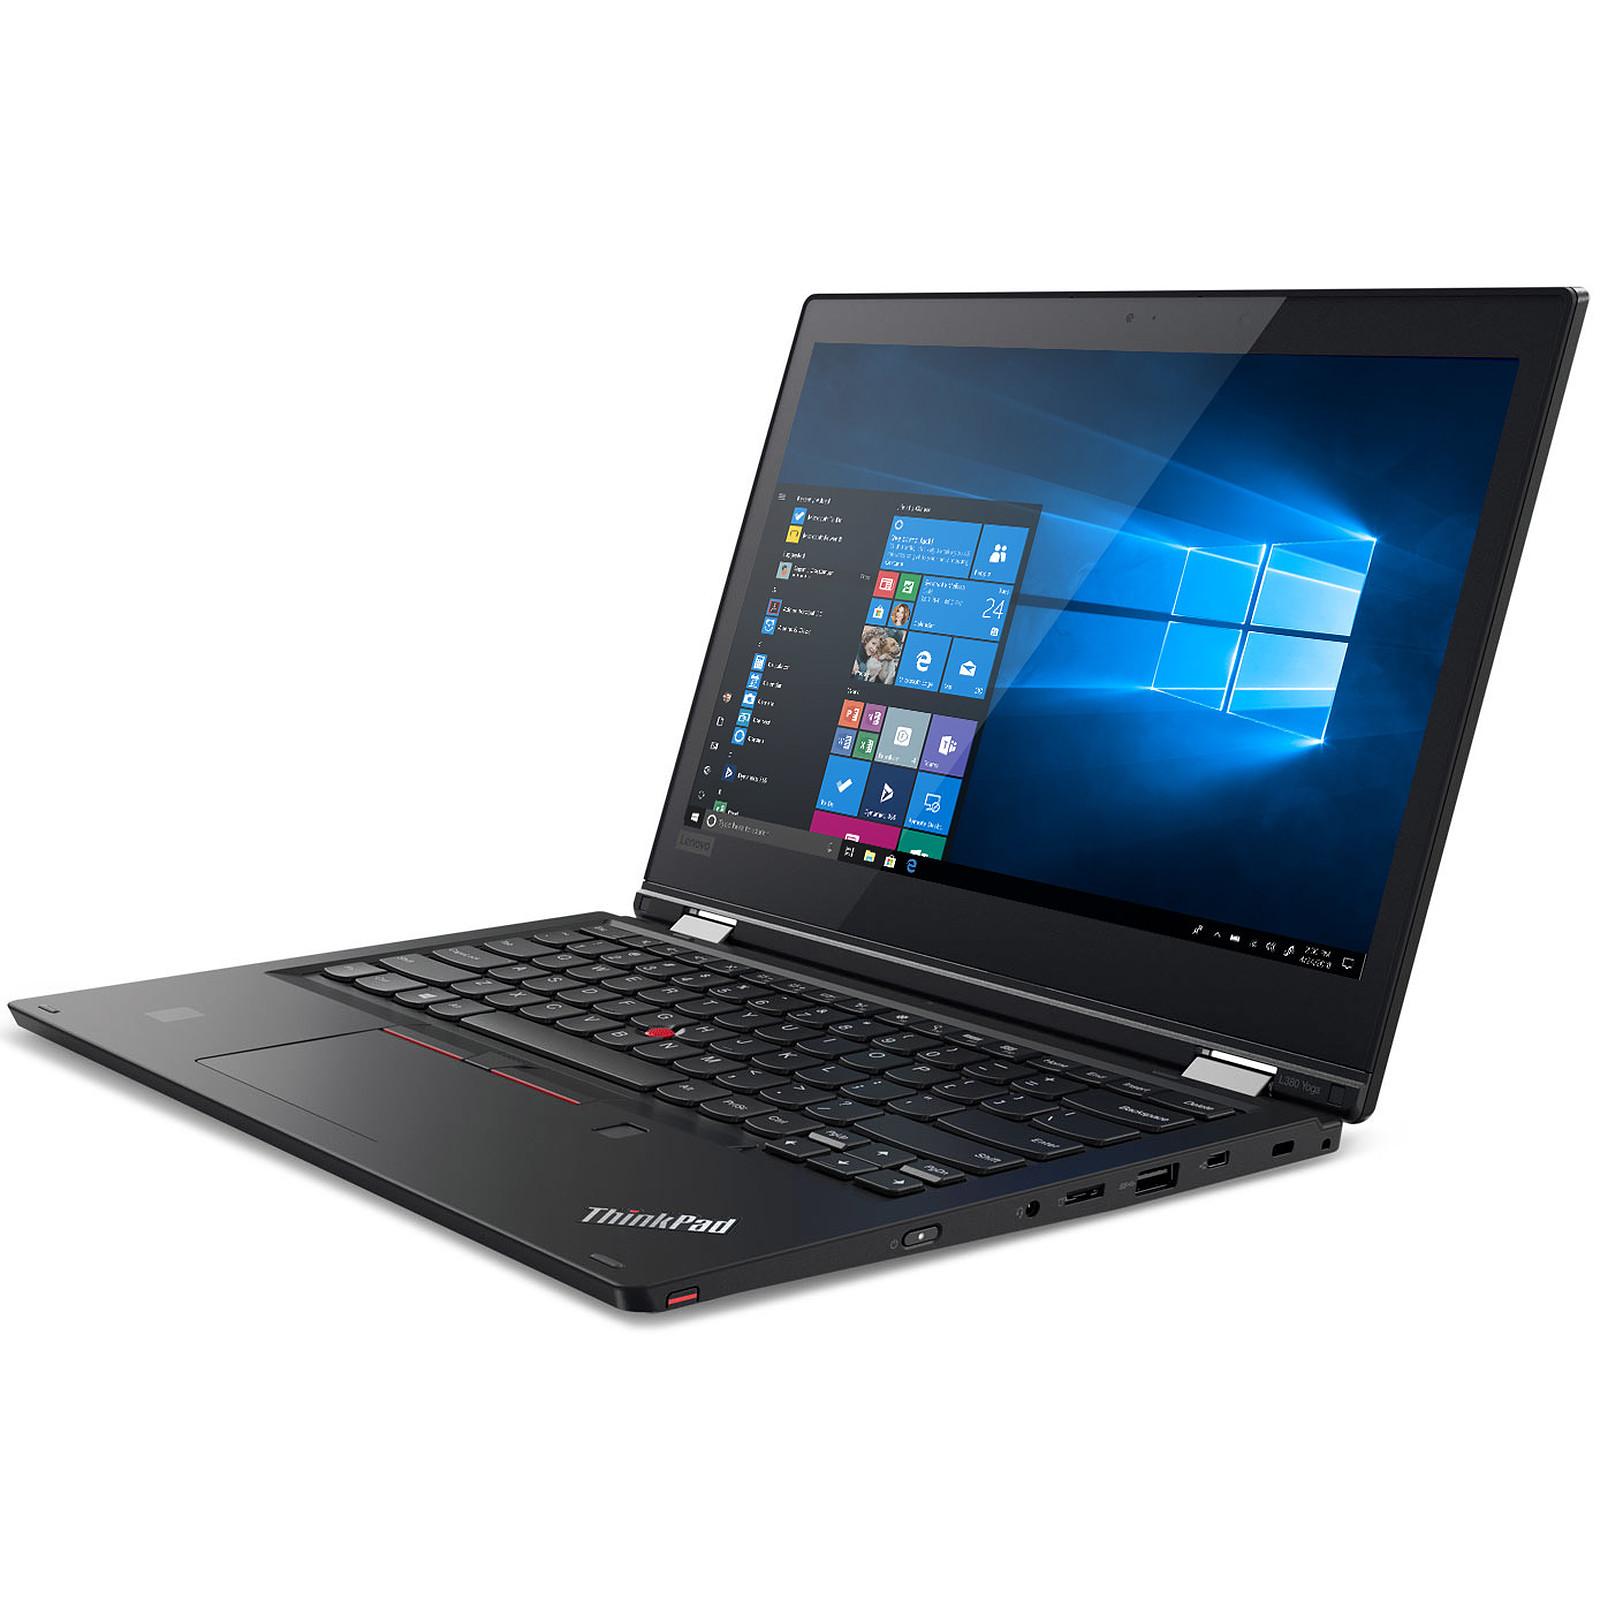 Lenovo ThinkPad L380 Yoga (20M7001BFR)